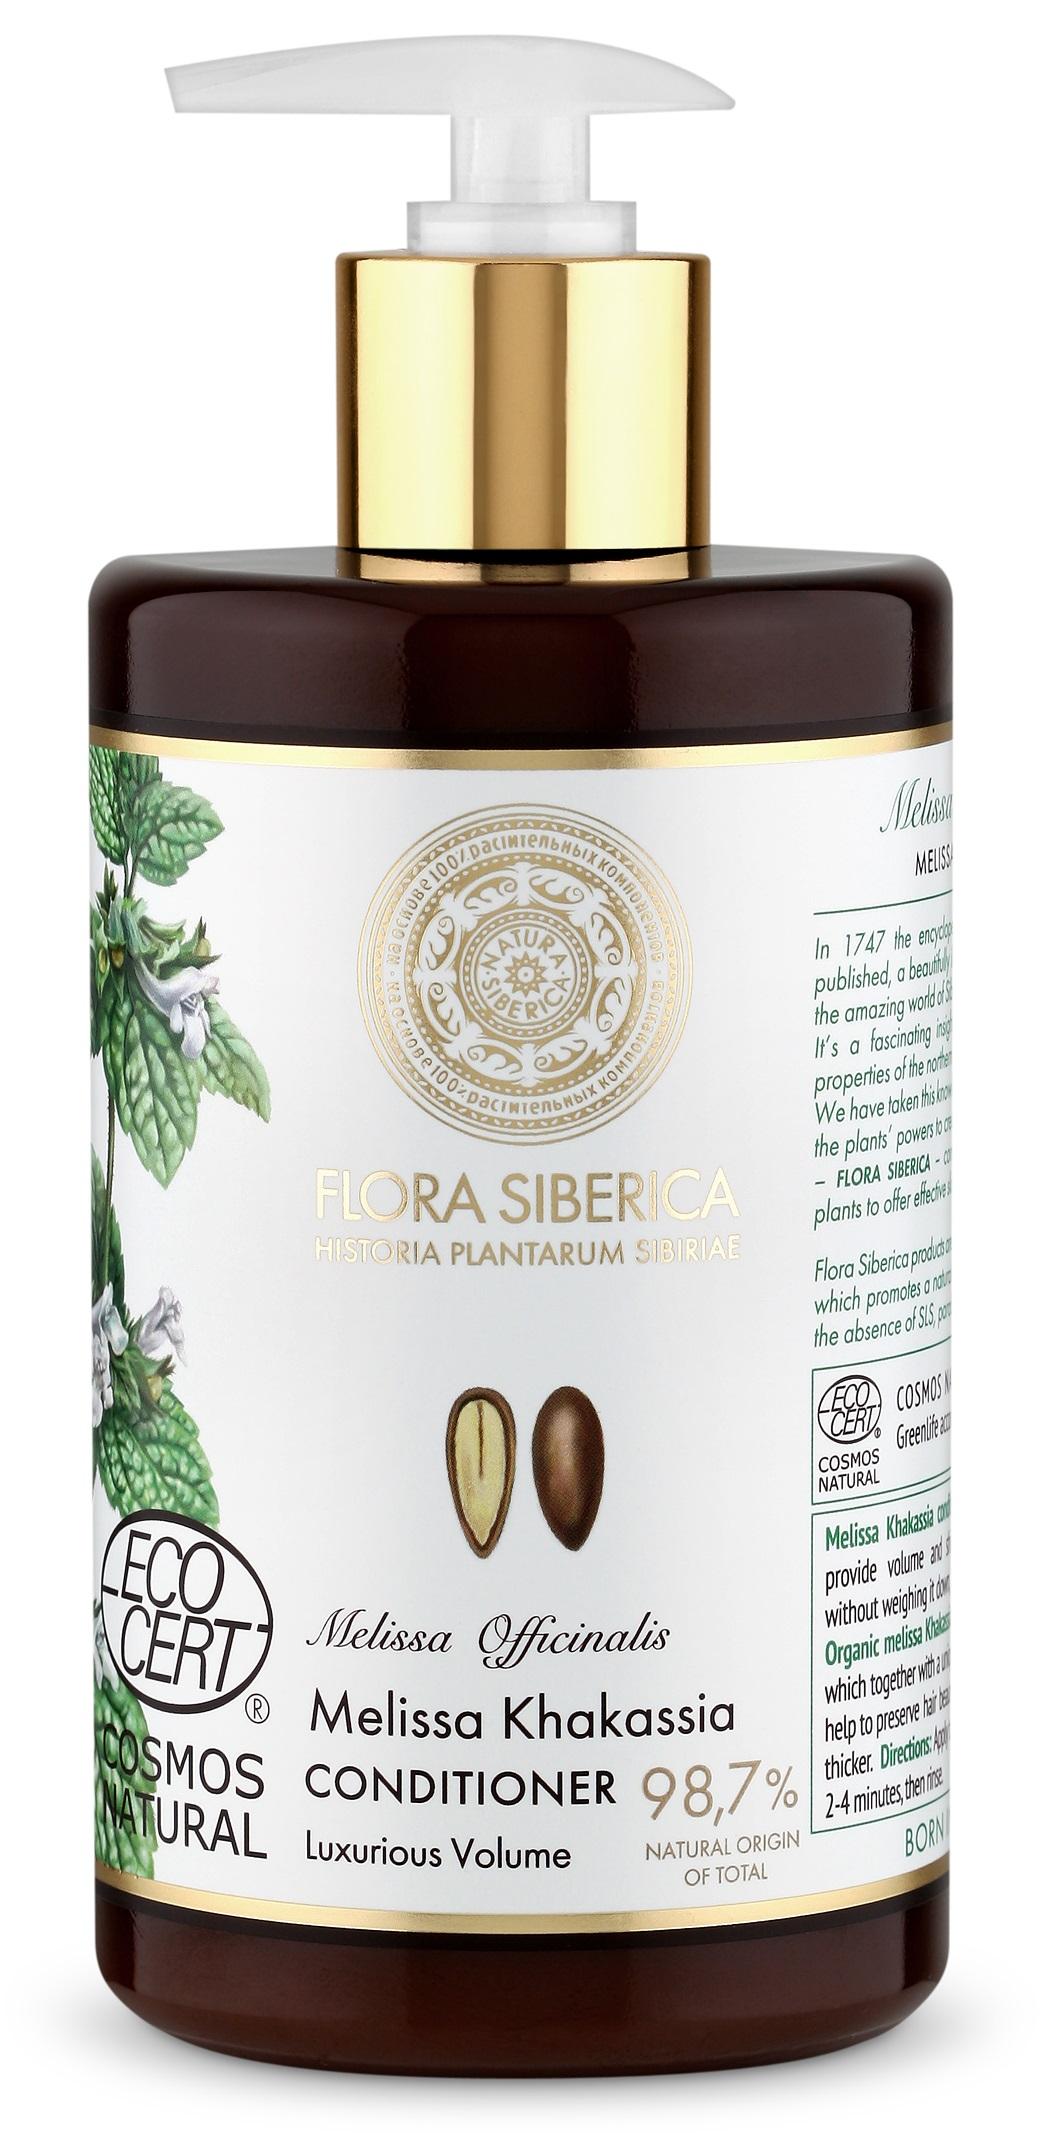 Natura Siberica Flora Siberica - Kondicionér na vlasy pre luxusný objem 480 ml